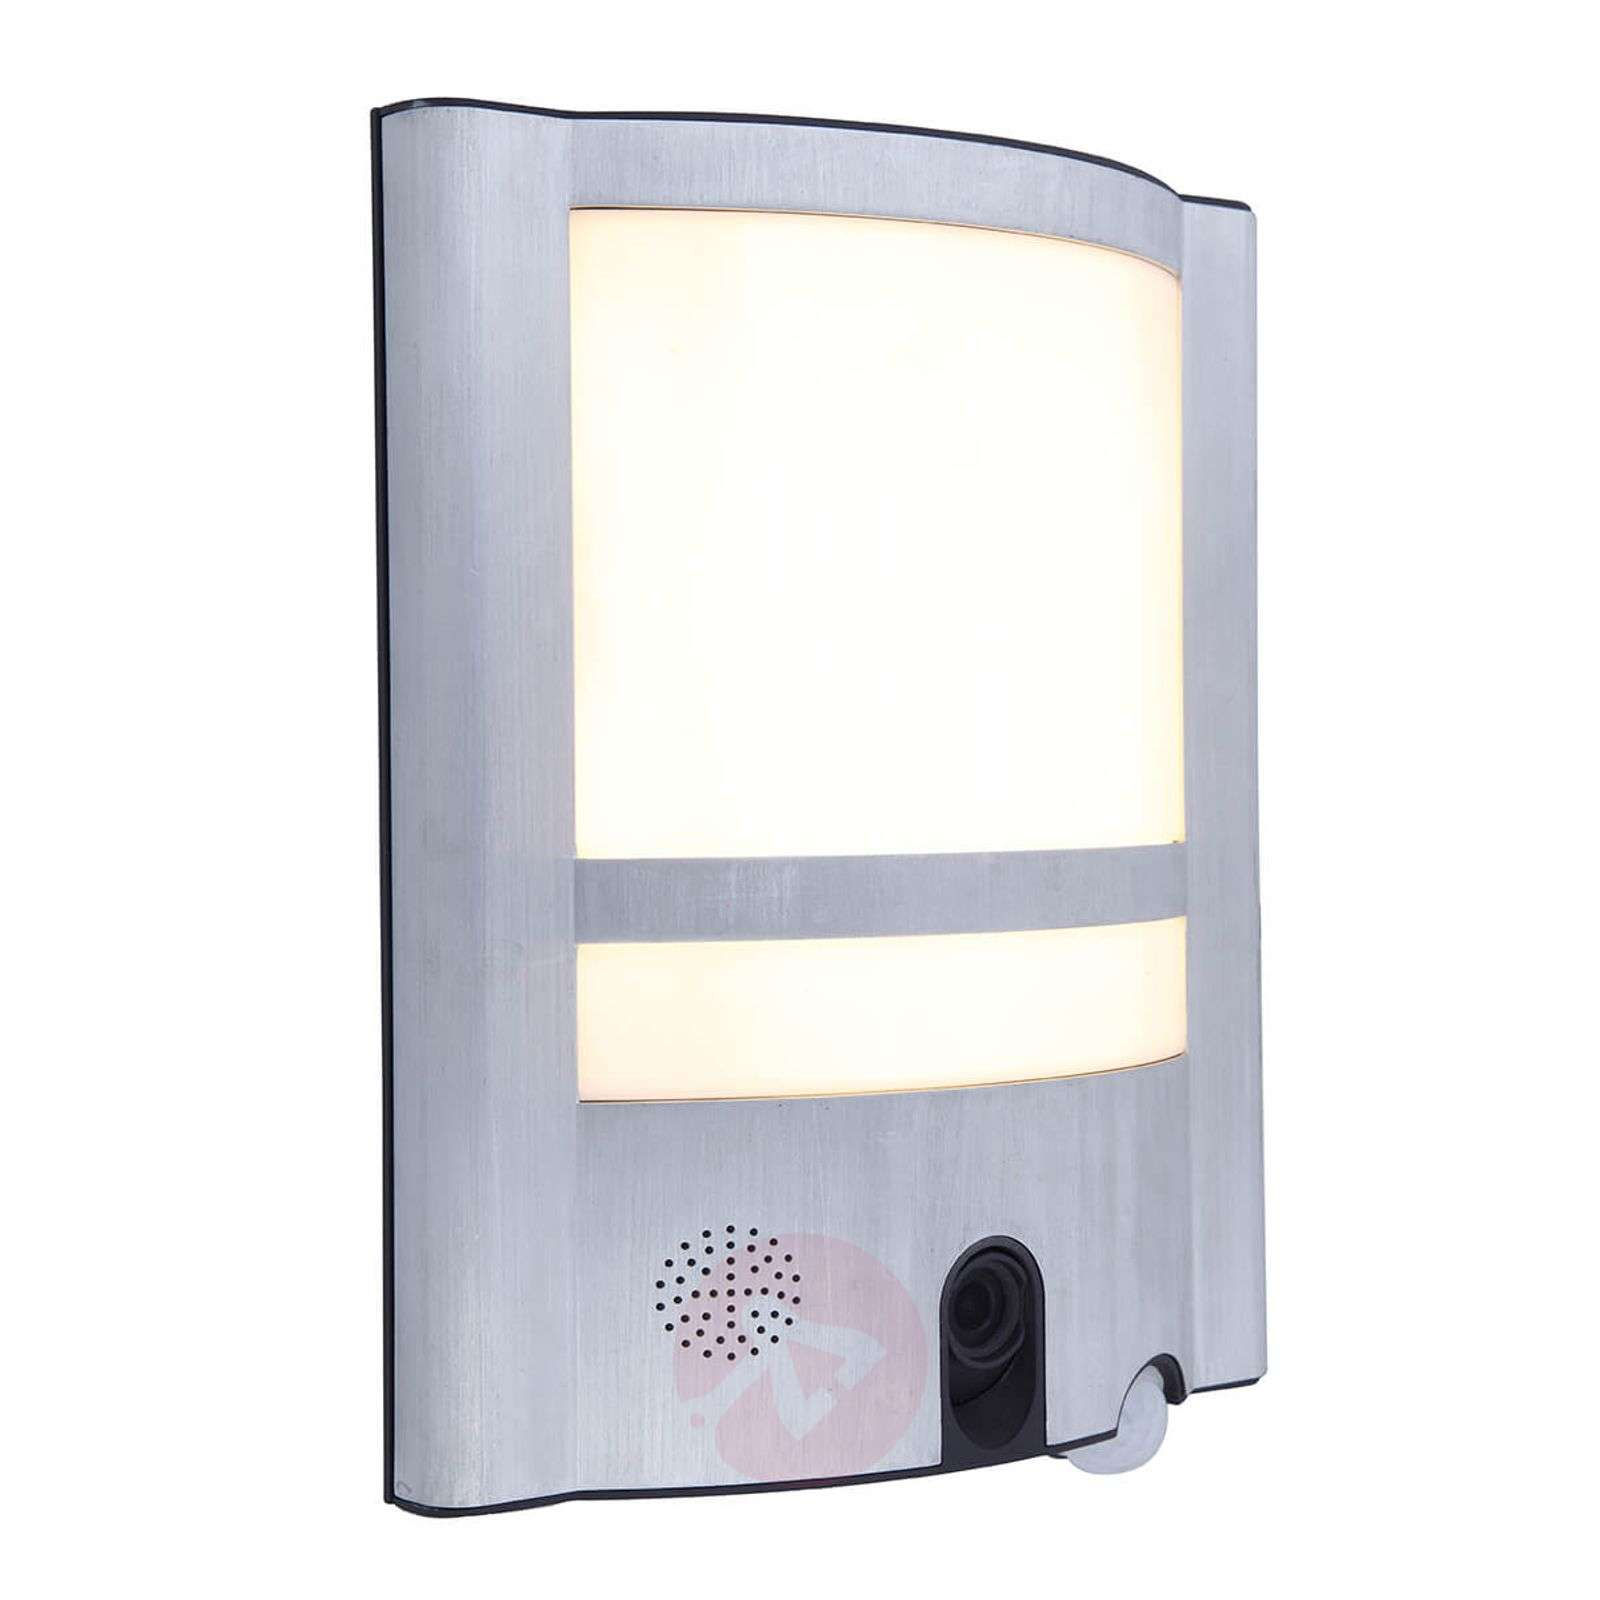 Vesta Cam outdoor wall light with sensor and camera-3006505-02